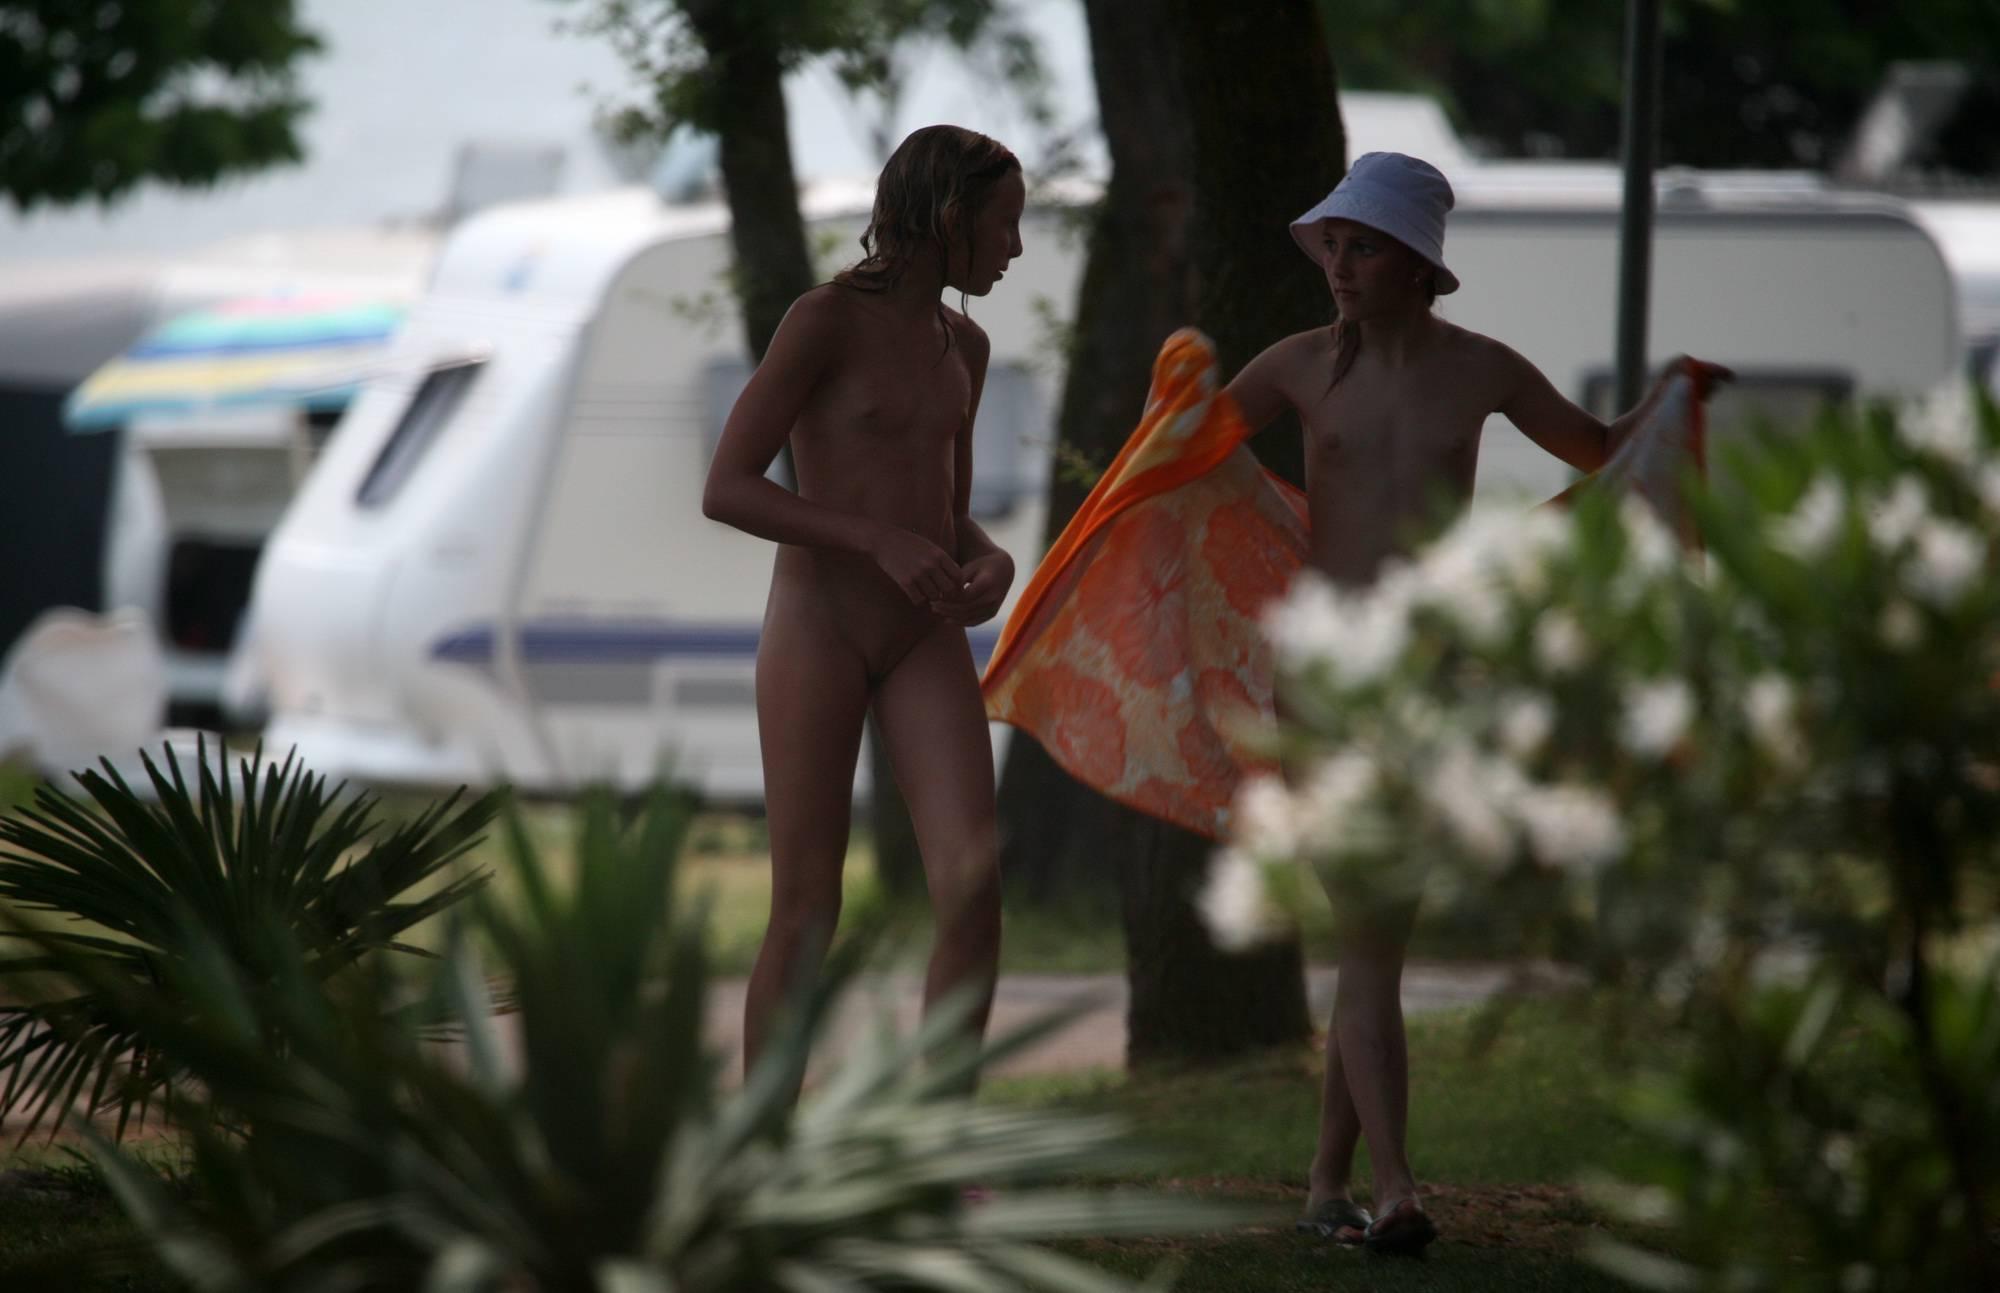 Nudist Photos Two Nudist Day Girlfriends - 1